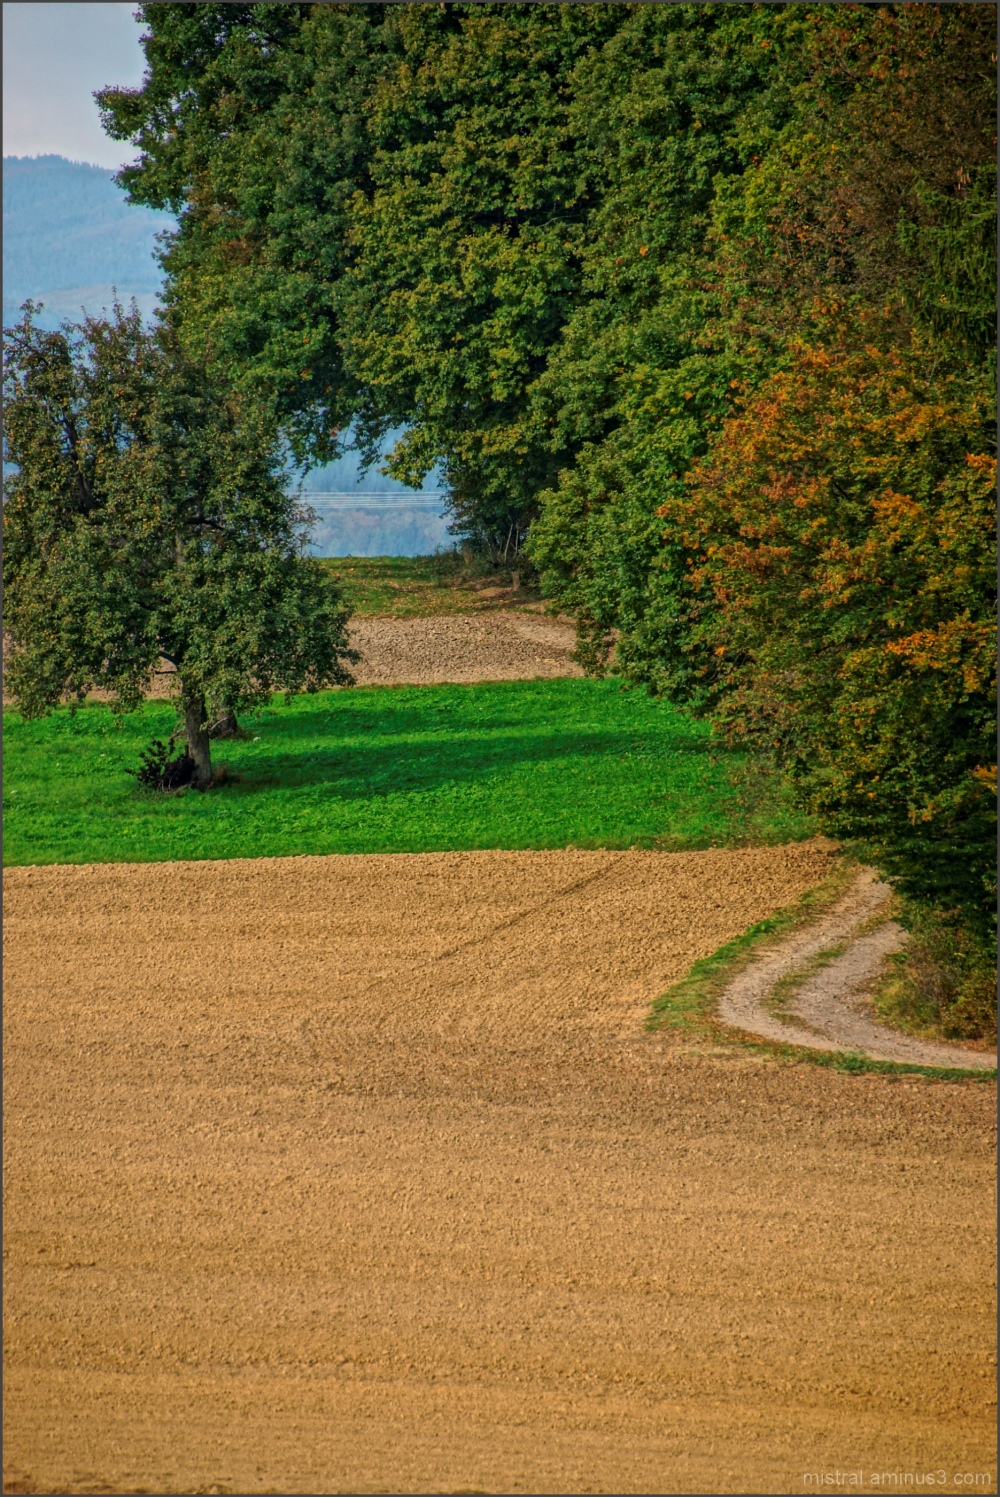 Le chemin au bord du champ